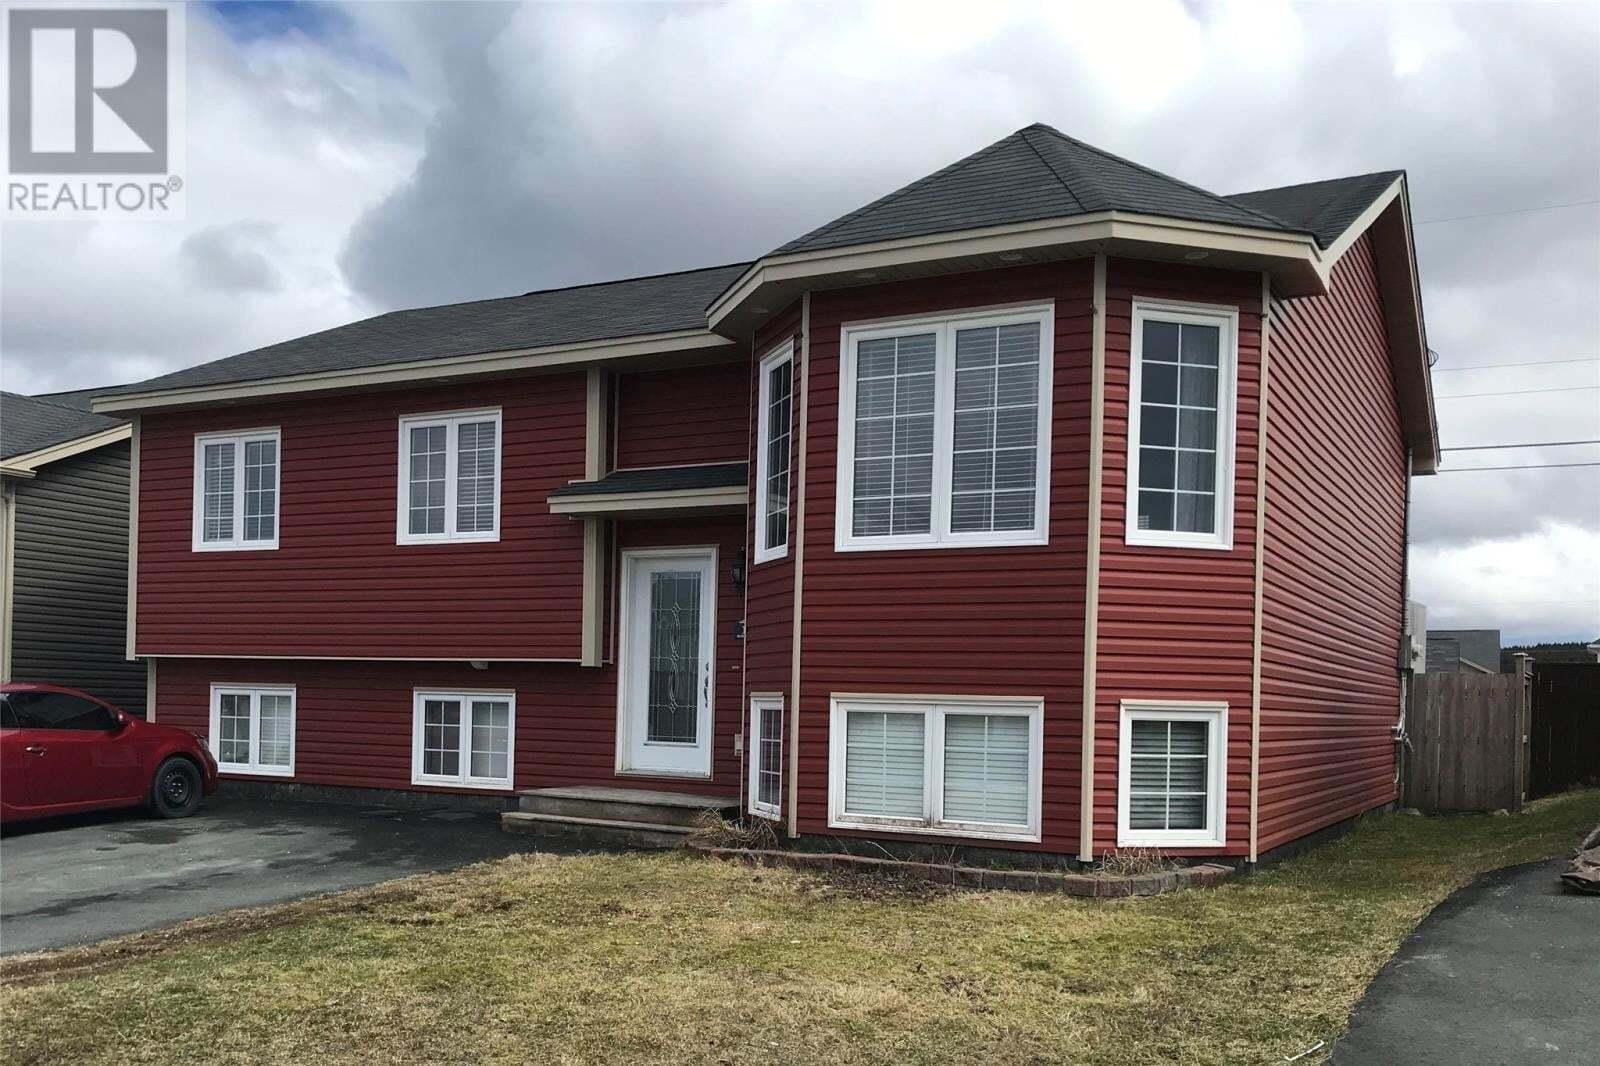 House for sale at 14 Rosalind St St John's Newfoundland - MLS: 1213884